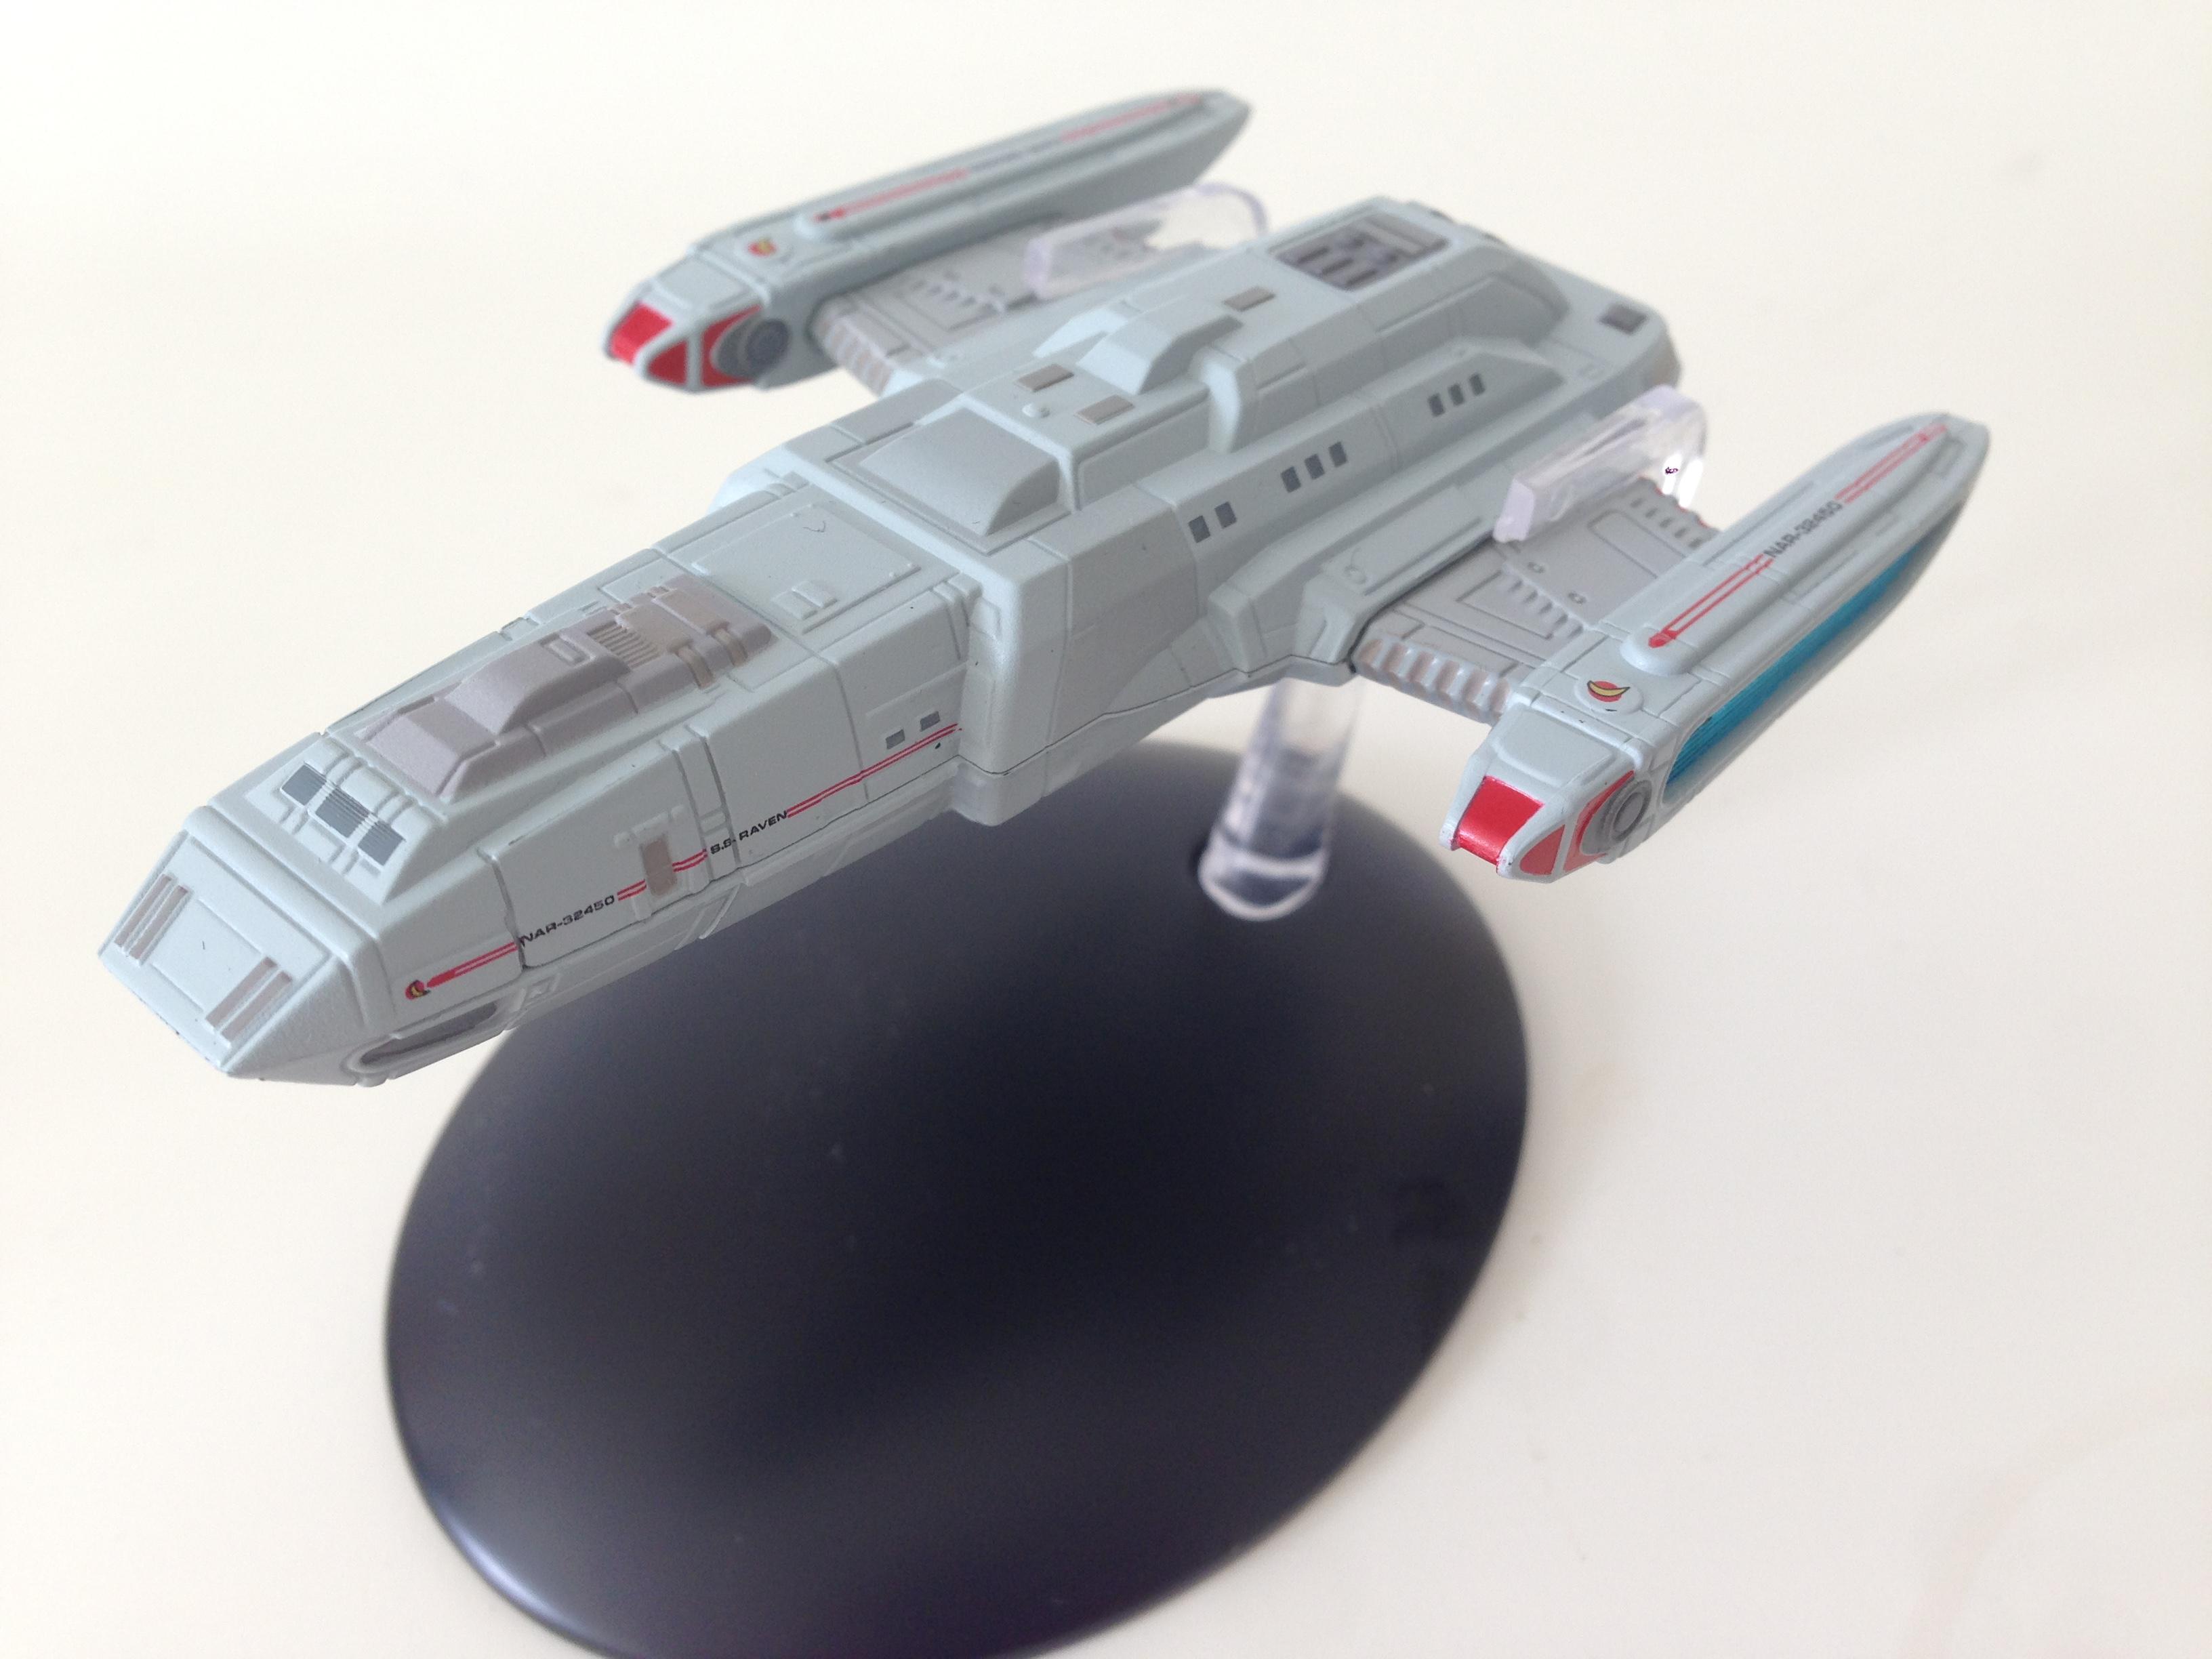 Die U.S.S. Raven aus Star Trek: Voyager (Foto: Star Trek HD)